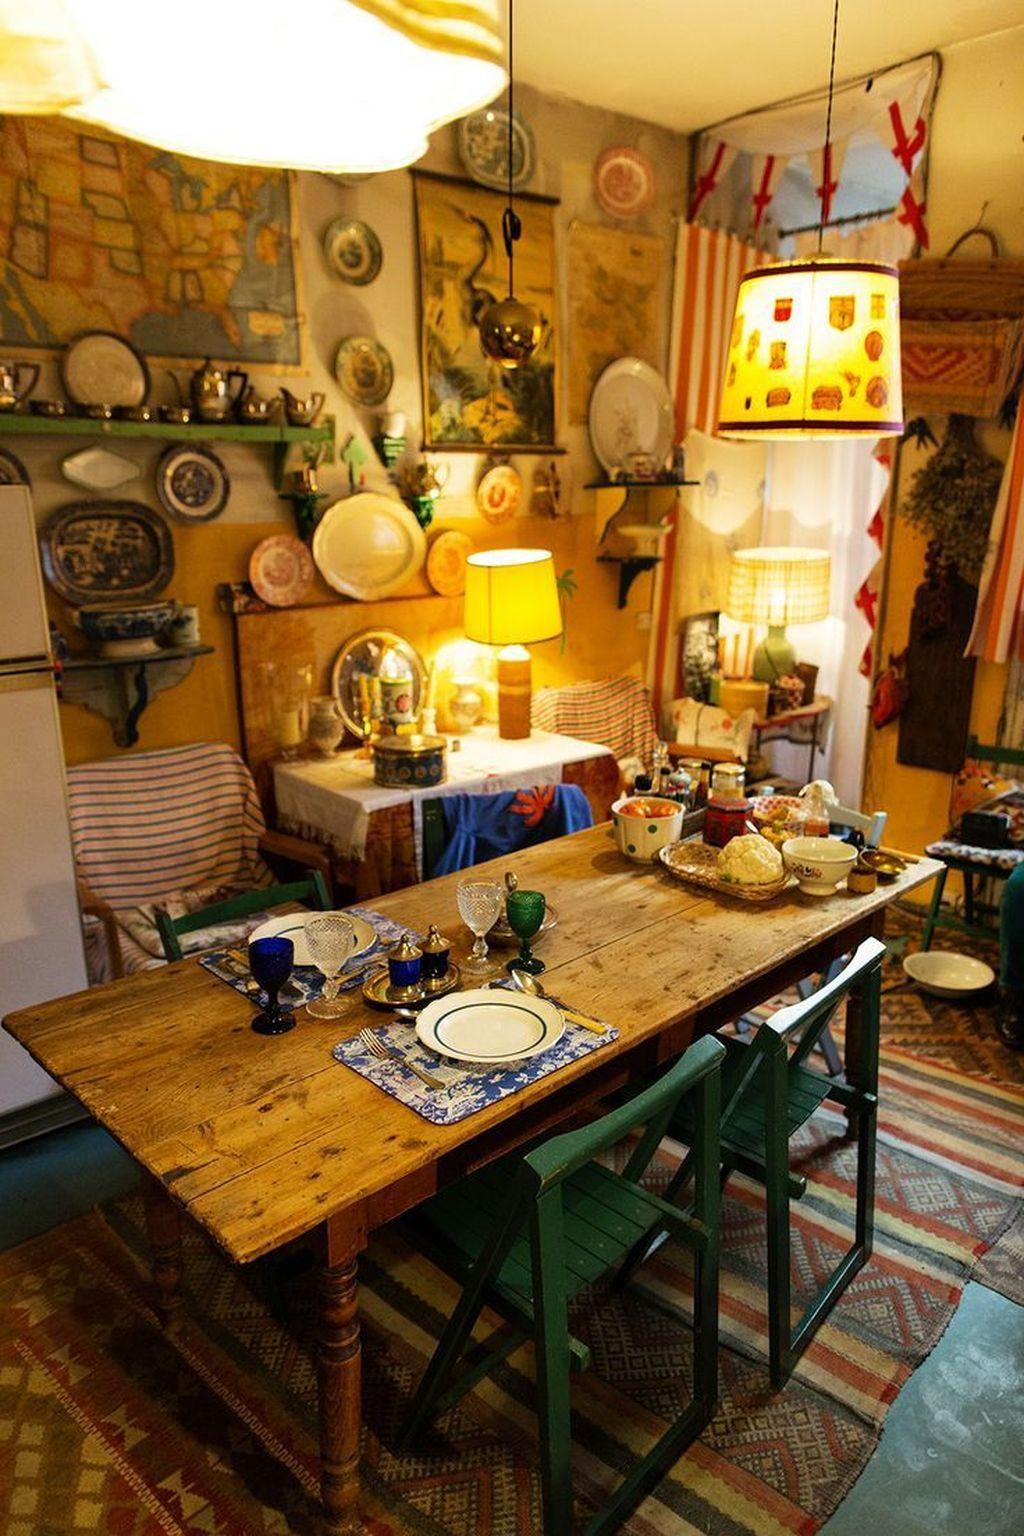 bohemian style kitchen image by sally mirick on kitchen bohemian kitchen bohemian style on boho chic decor living room bohemian kitchen id=28511